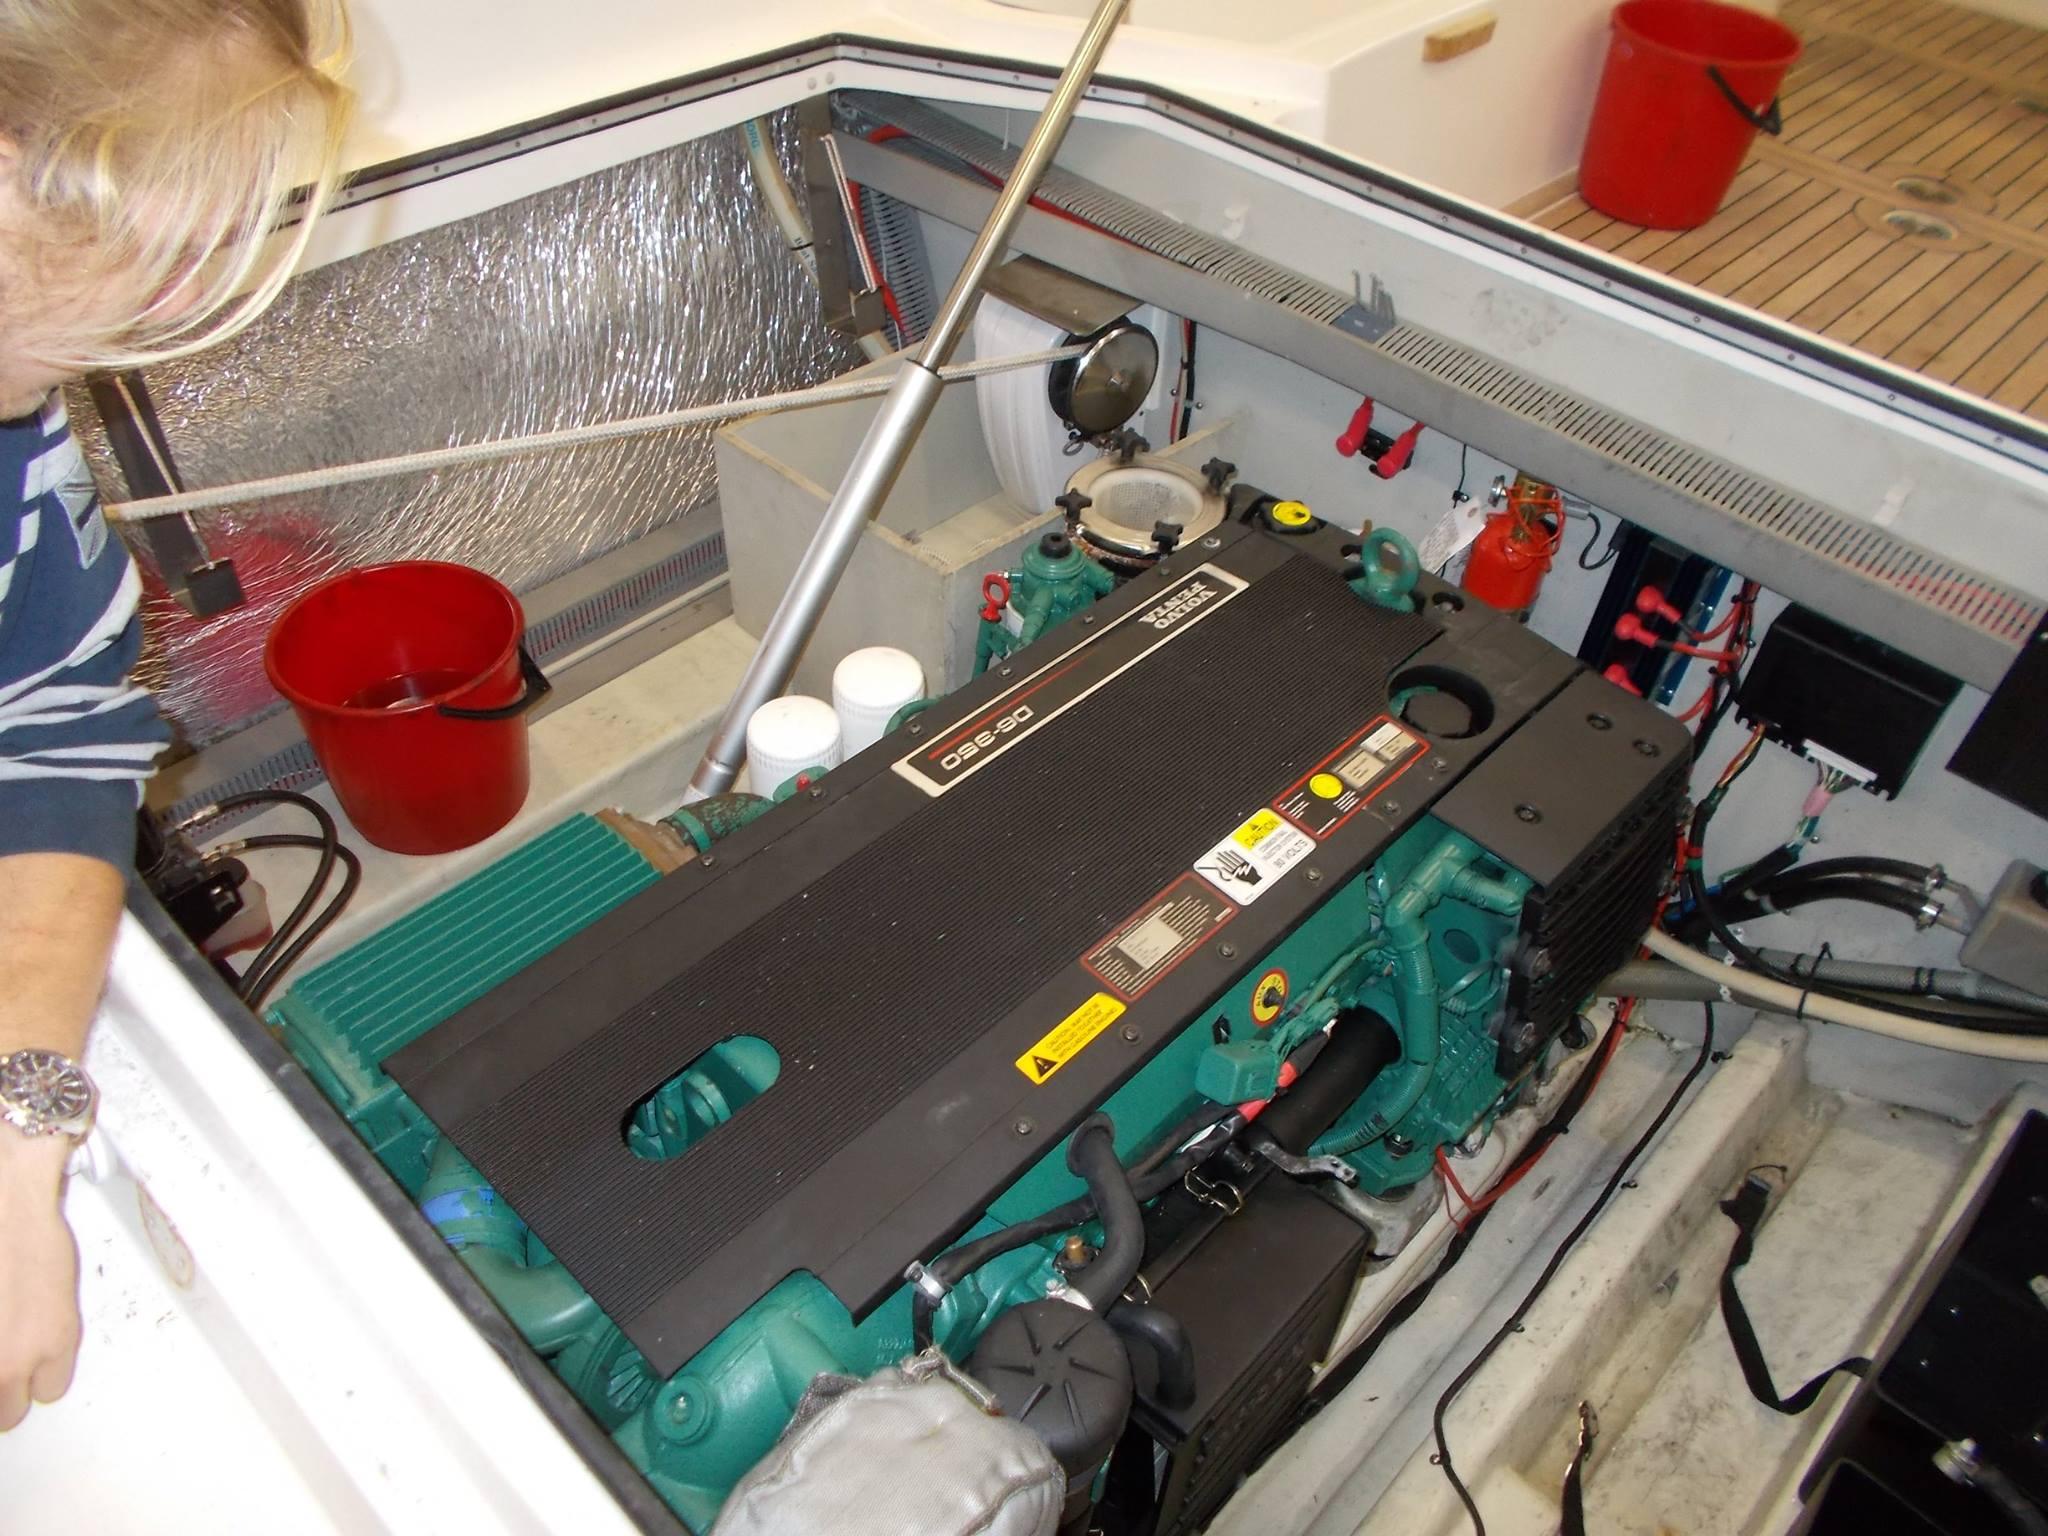 BÅTMOTOR SERVICE - Vi har lang erfaring med båtmotor. Vi tar service på alle typer motorer (Utenbords og Innenbords)